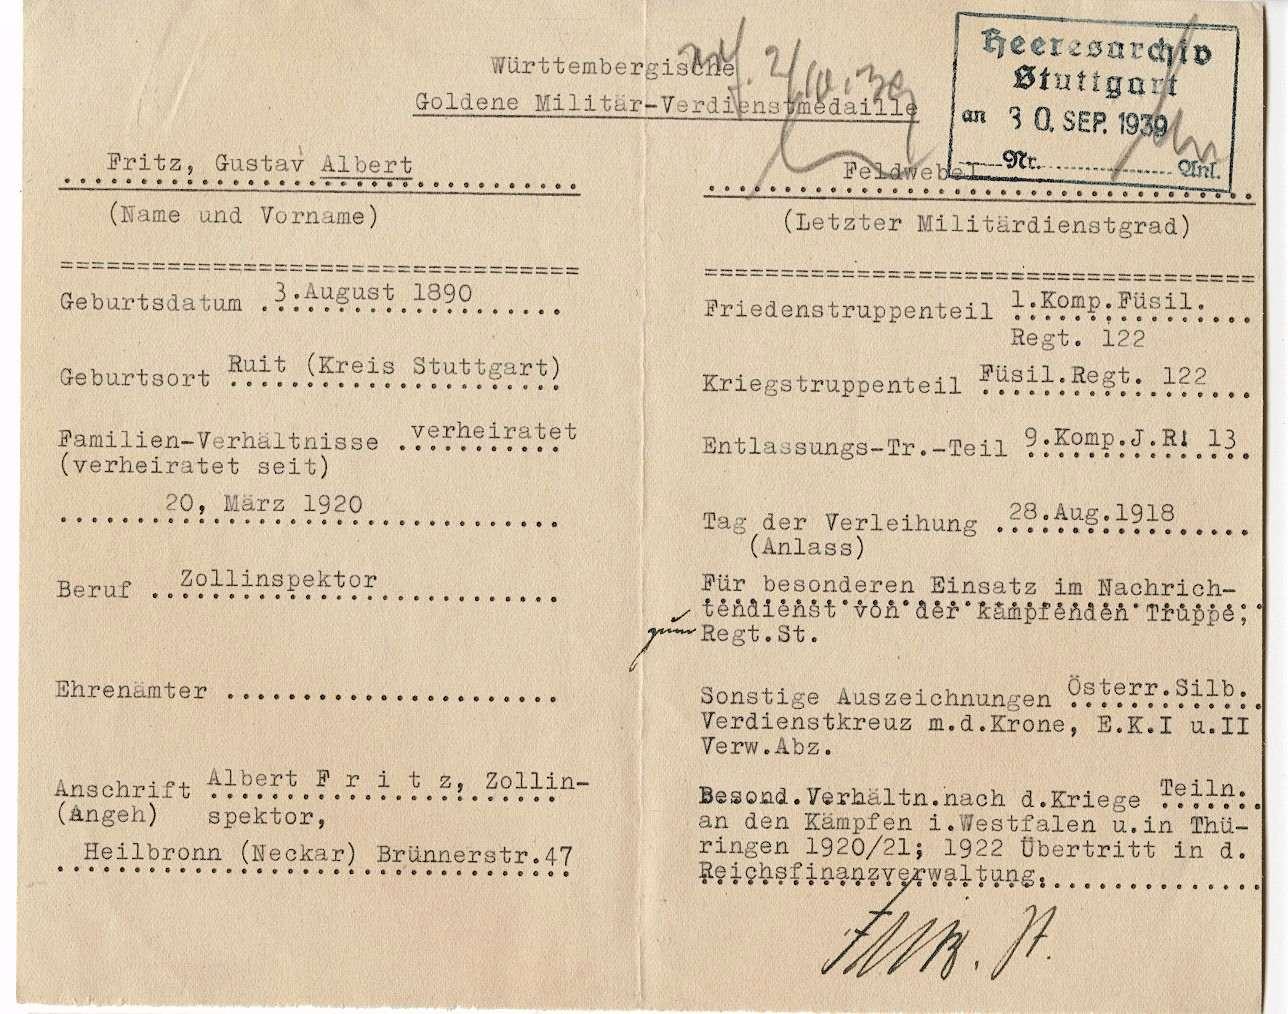 Fritz, Albert Gustav, Bild 3